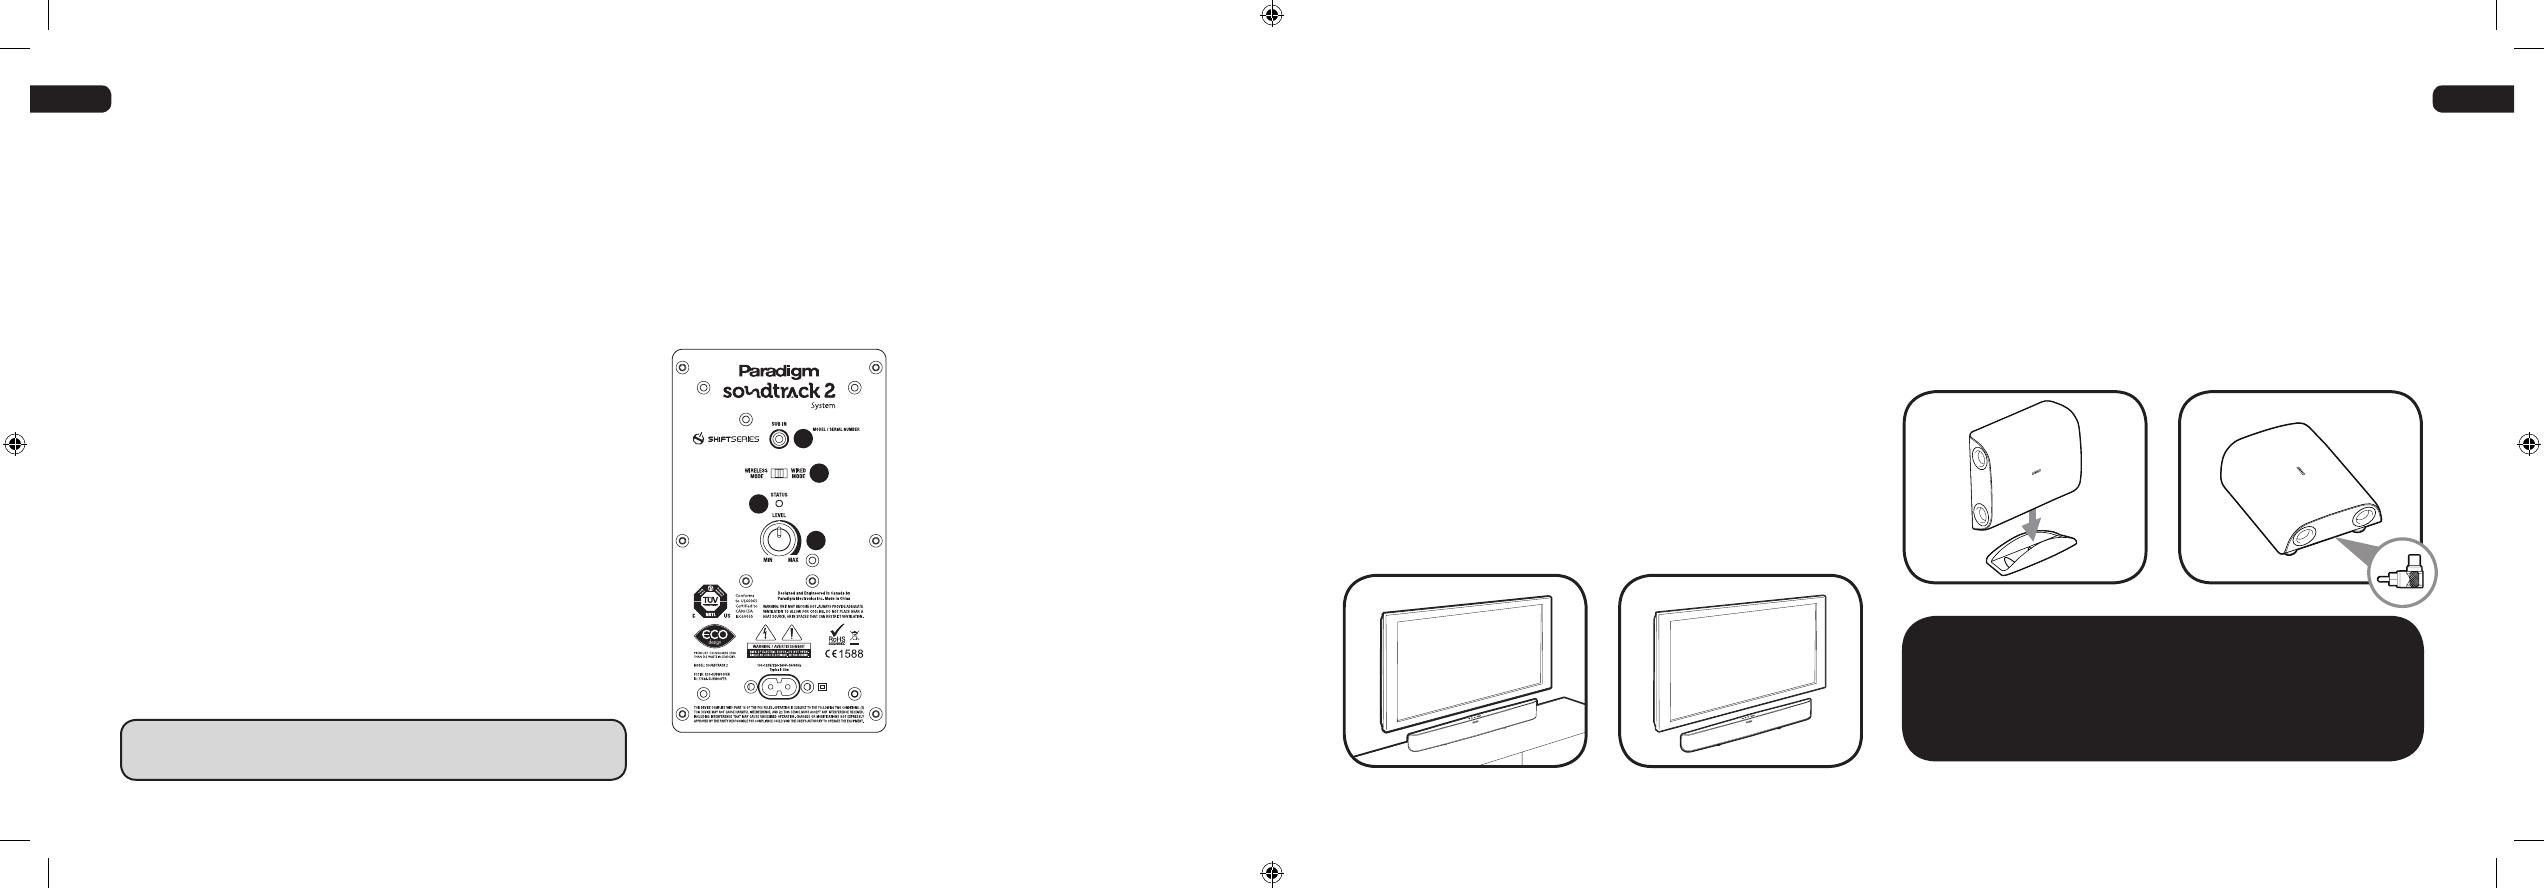 Paradigm Speaker Ce1588 Users Manual